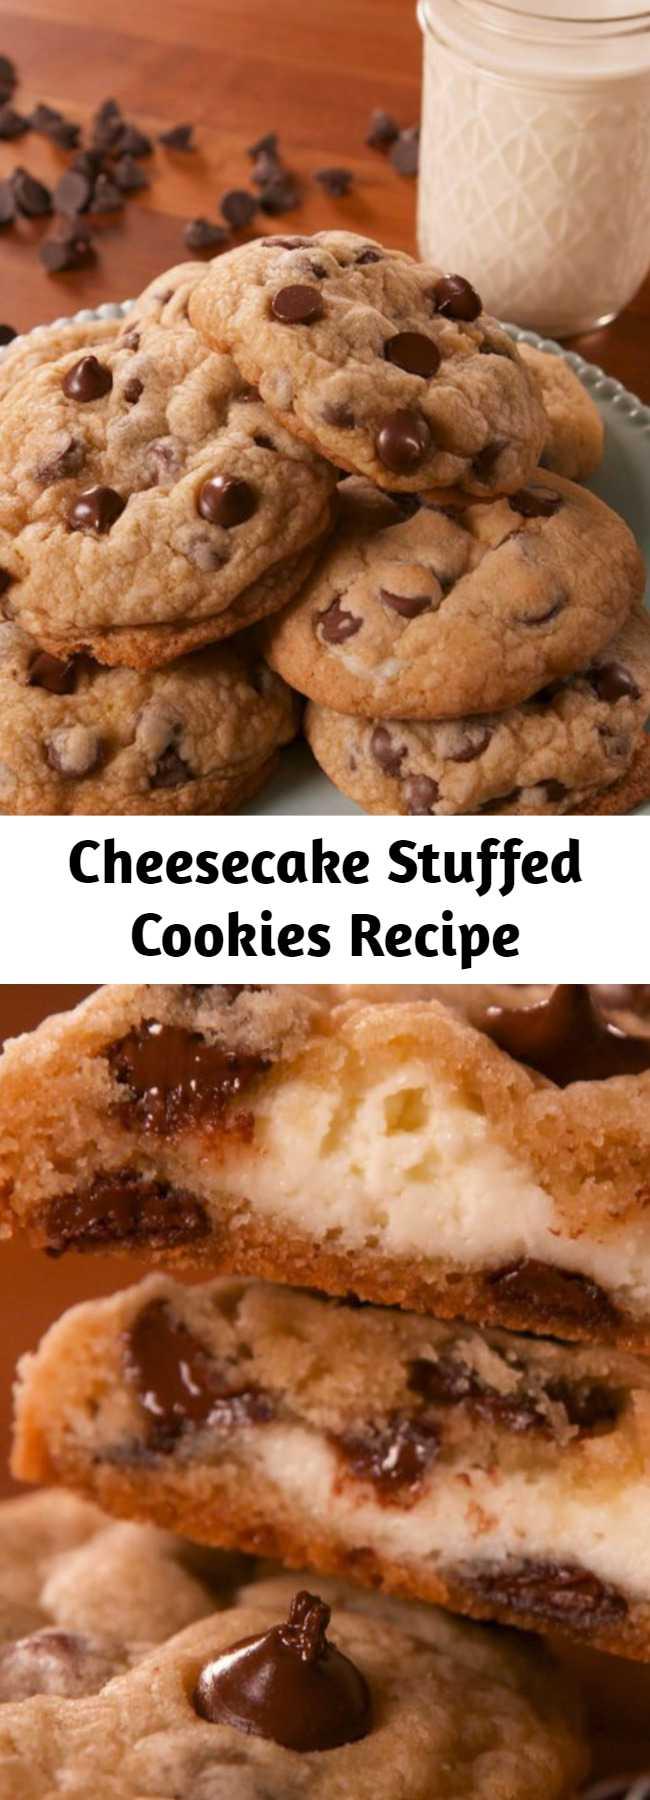 Cheesecake Stuffed Cookies Recipe - Have your cheesecake and your cookie too. #food #easyrecipe #baking #dessert #cookies